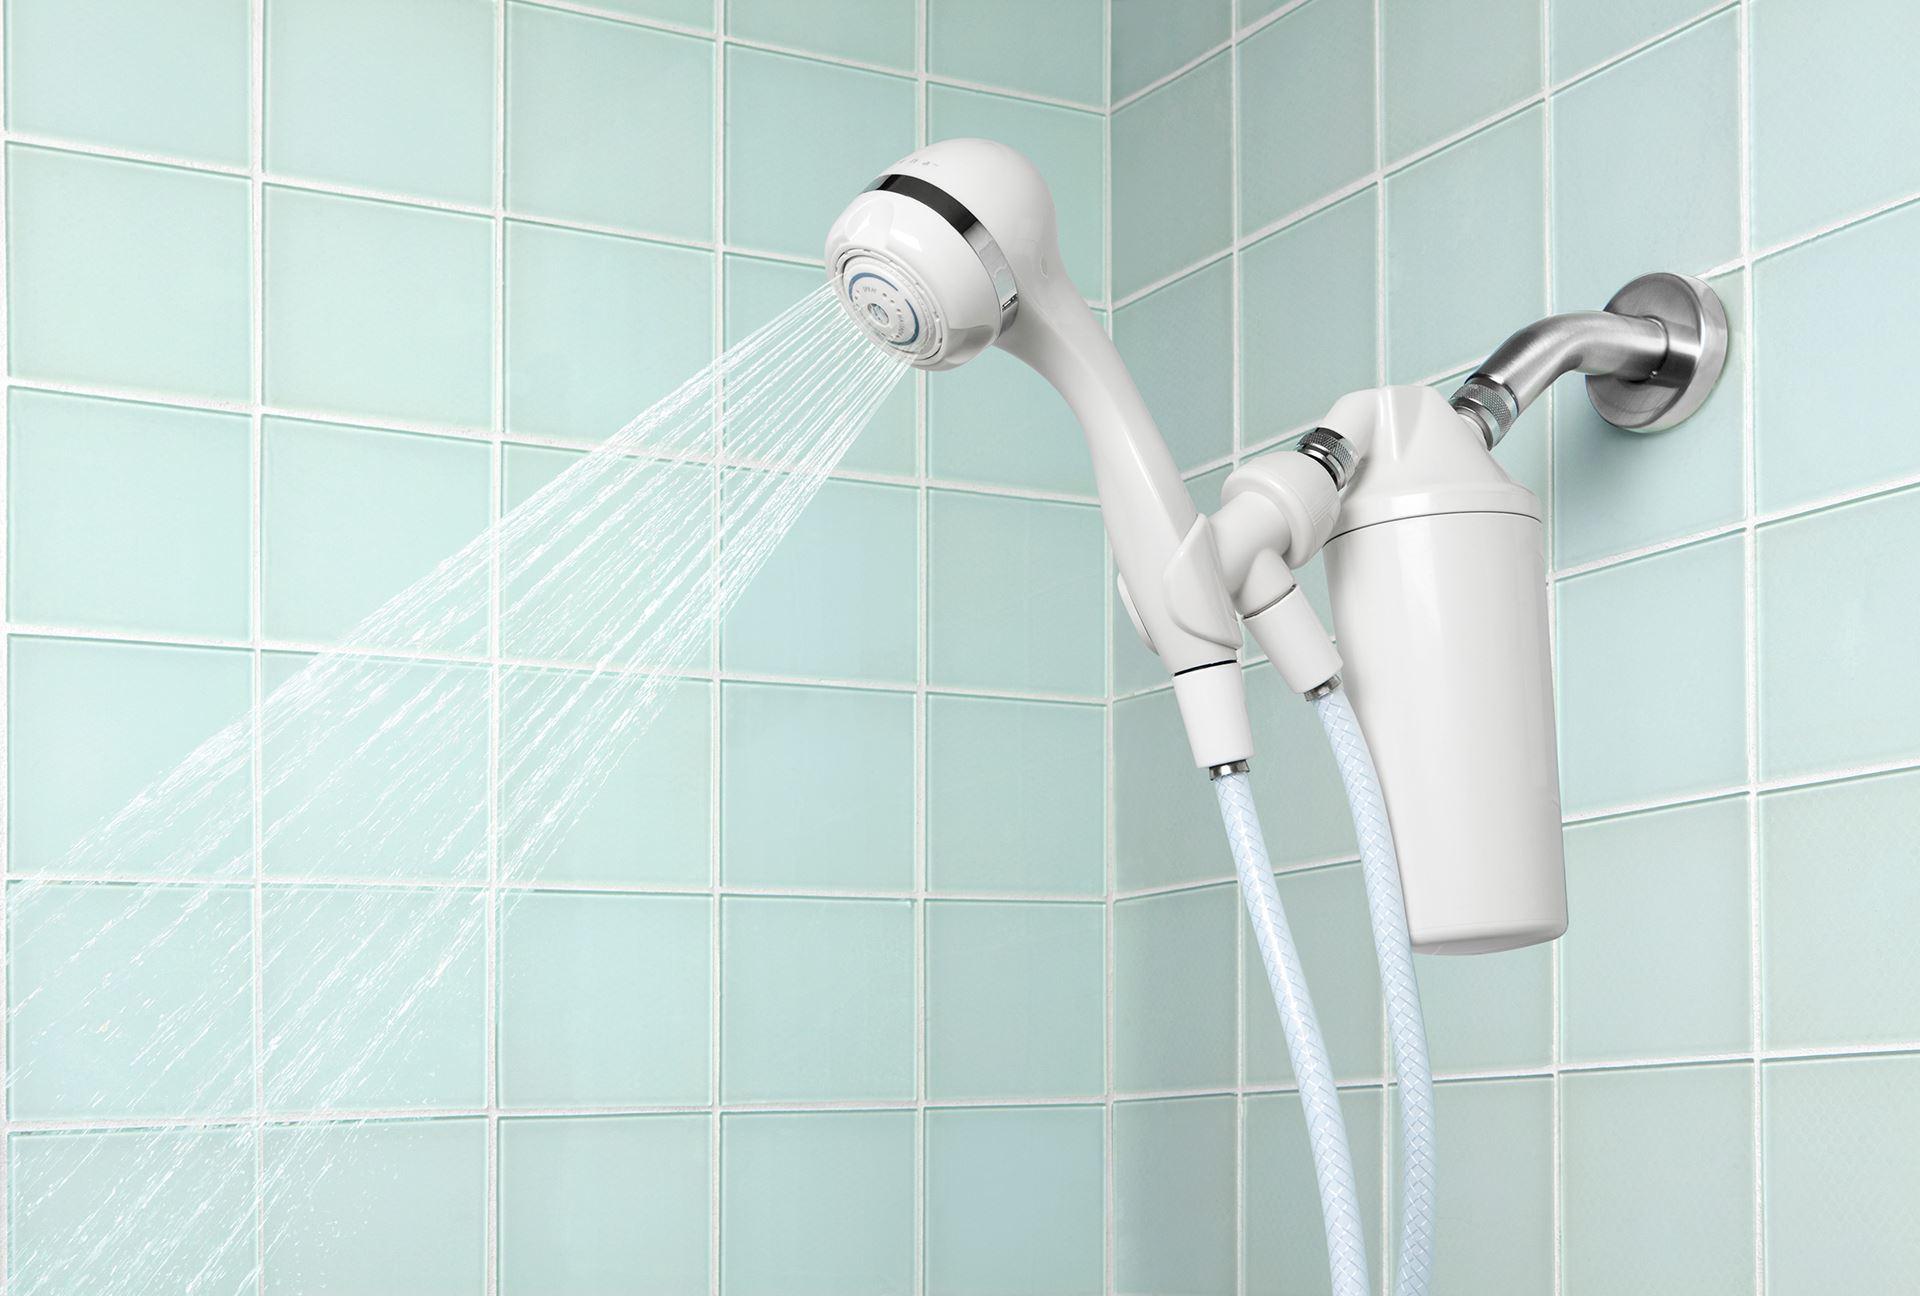 Aquasana uruguay filtro premium para ba o con ducha tel fono - Bano con ducha ...